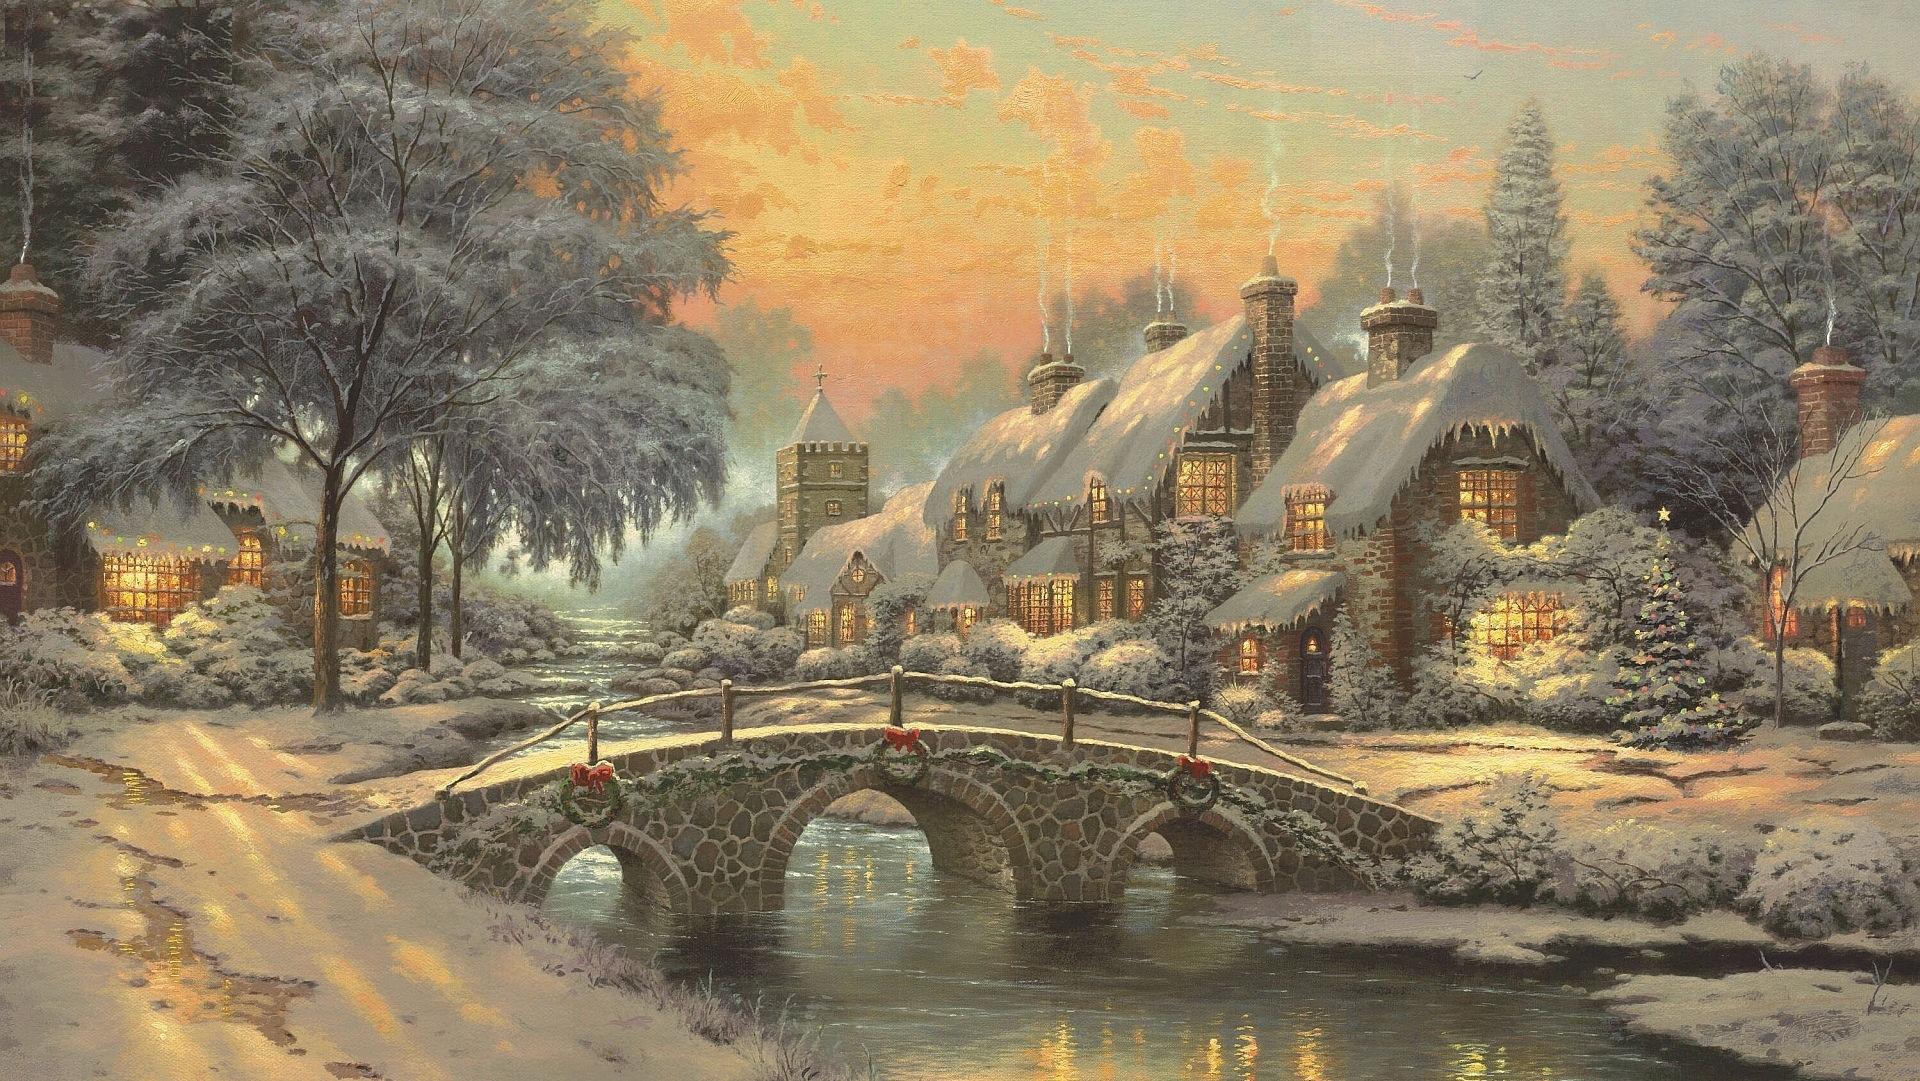 Bridge Christmas Christmas Tree House Painting Village 1920x1081